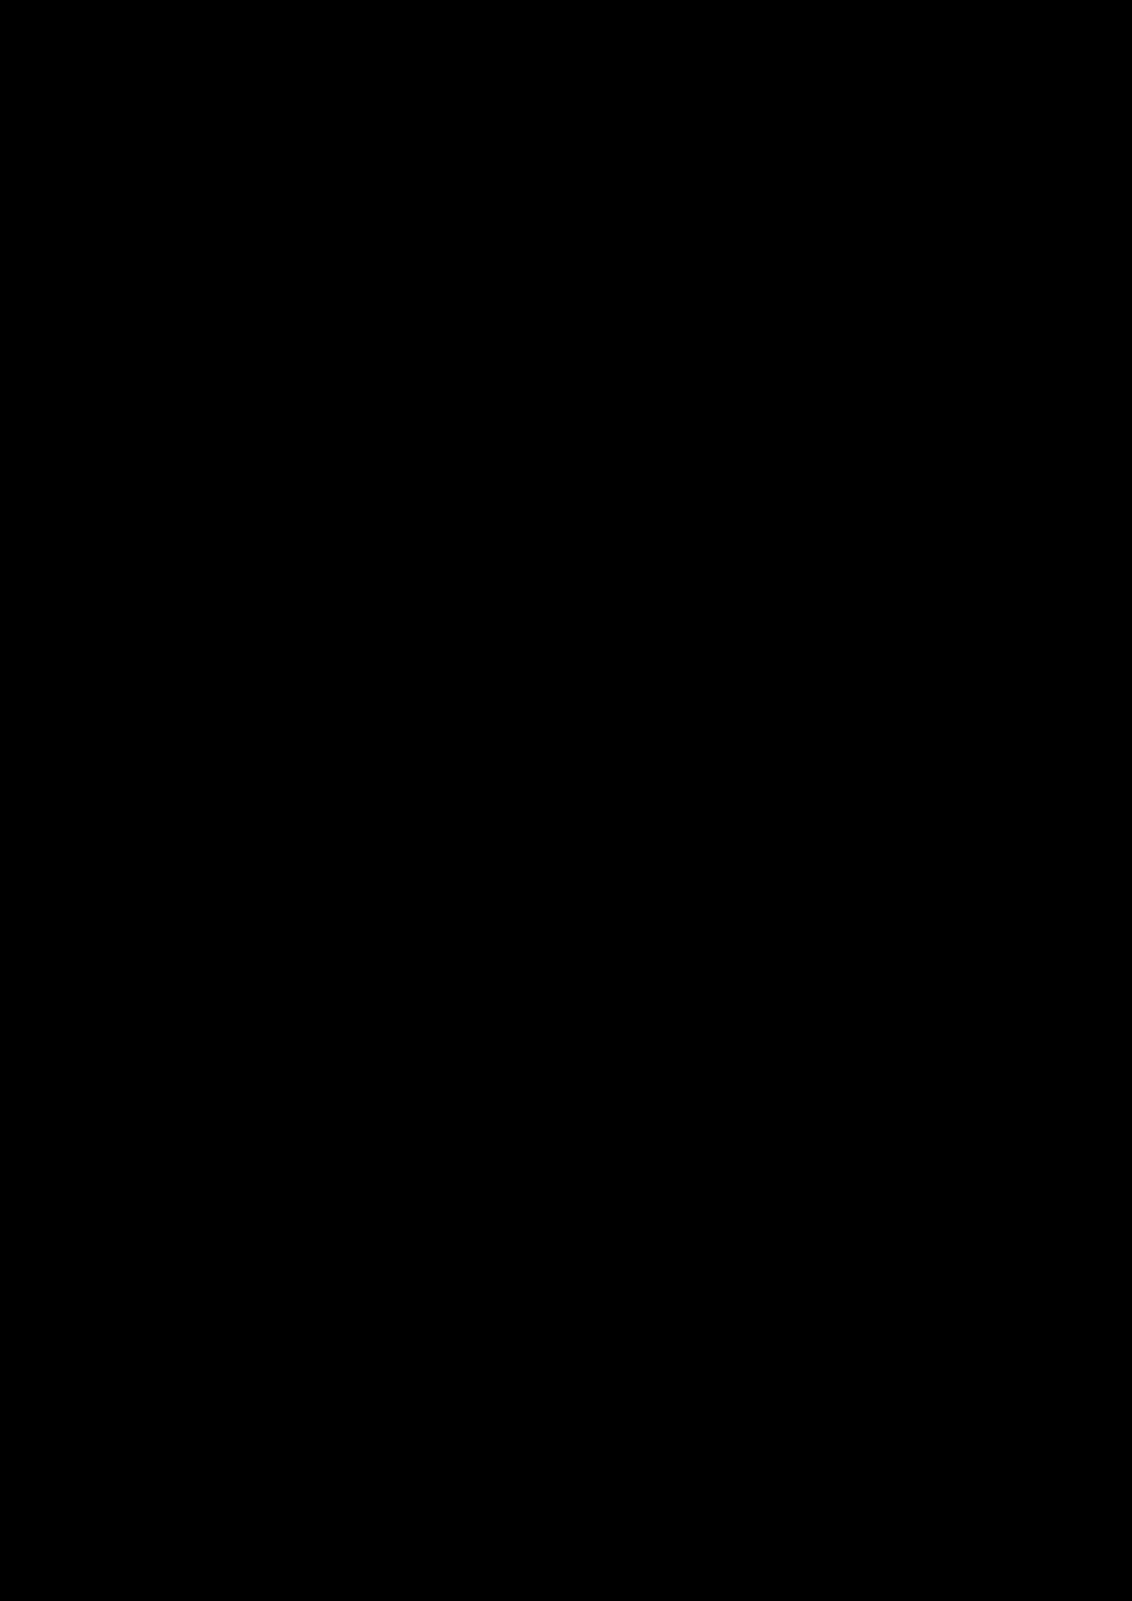 Mrs. Vandebilt slide, Image 14